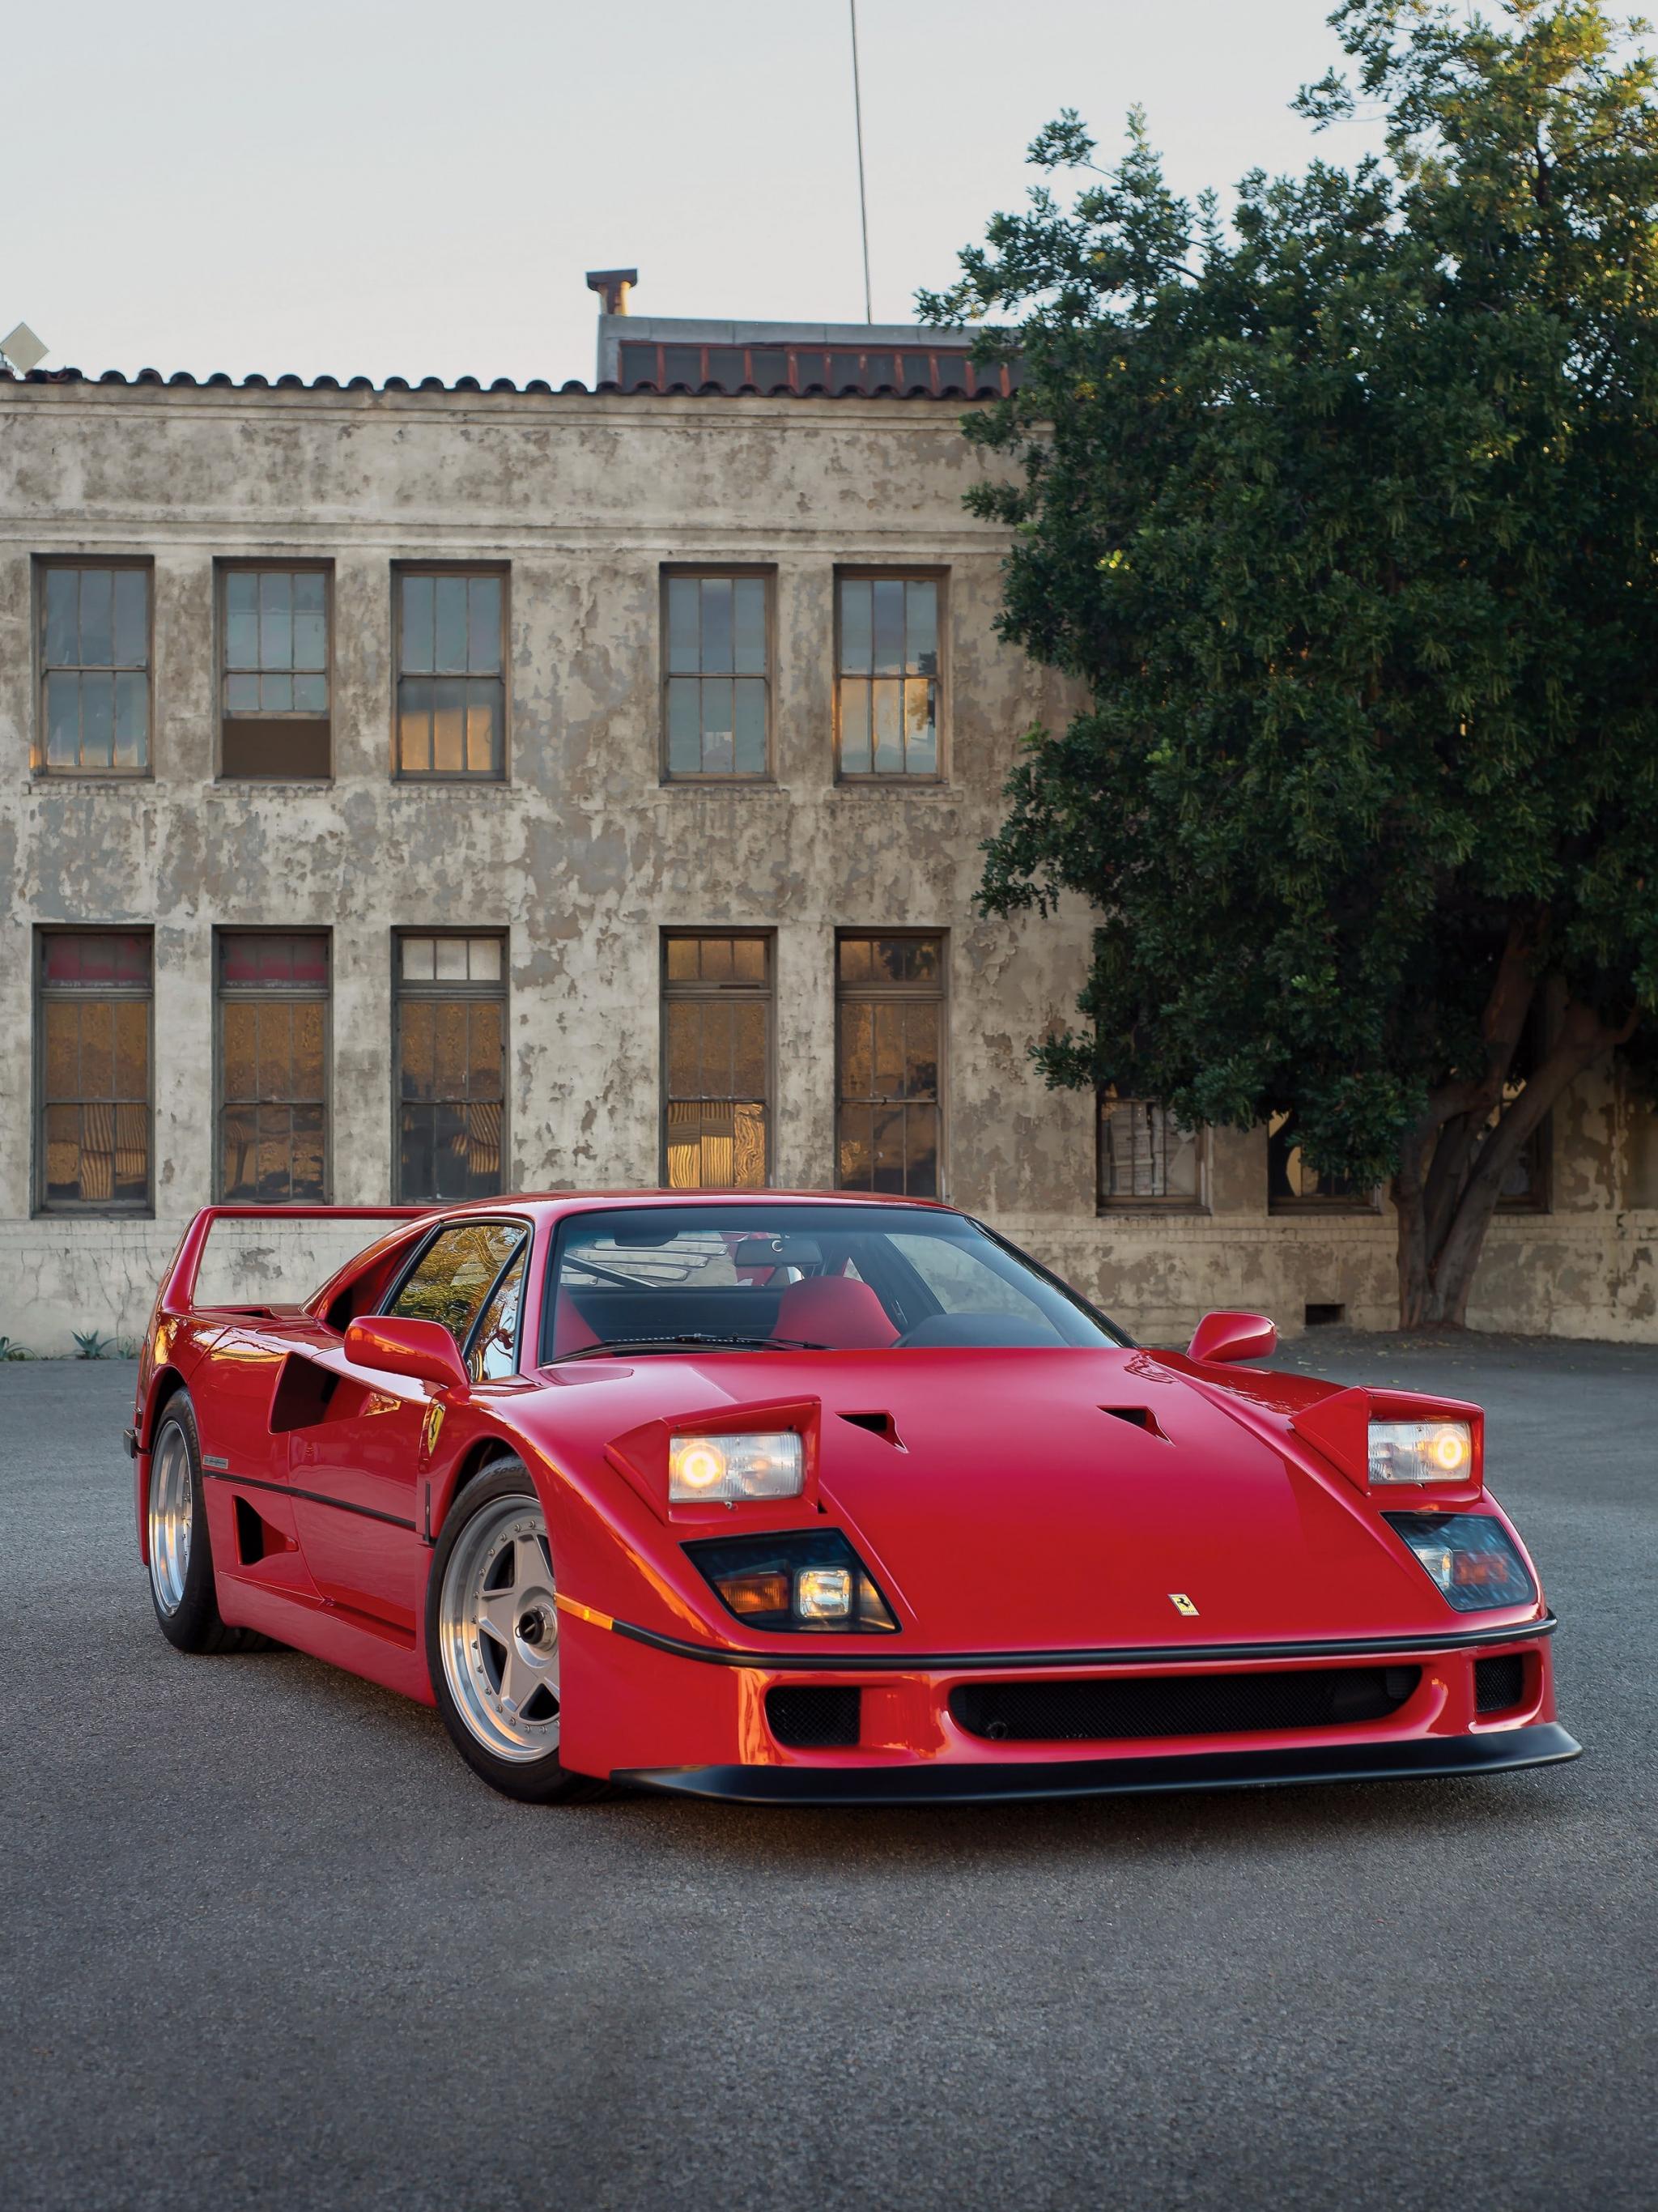 Free Download Ferrari F40 Hd Wallpapers 7wallpapersnet